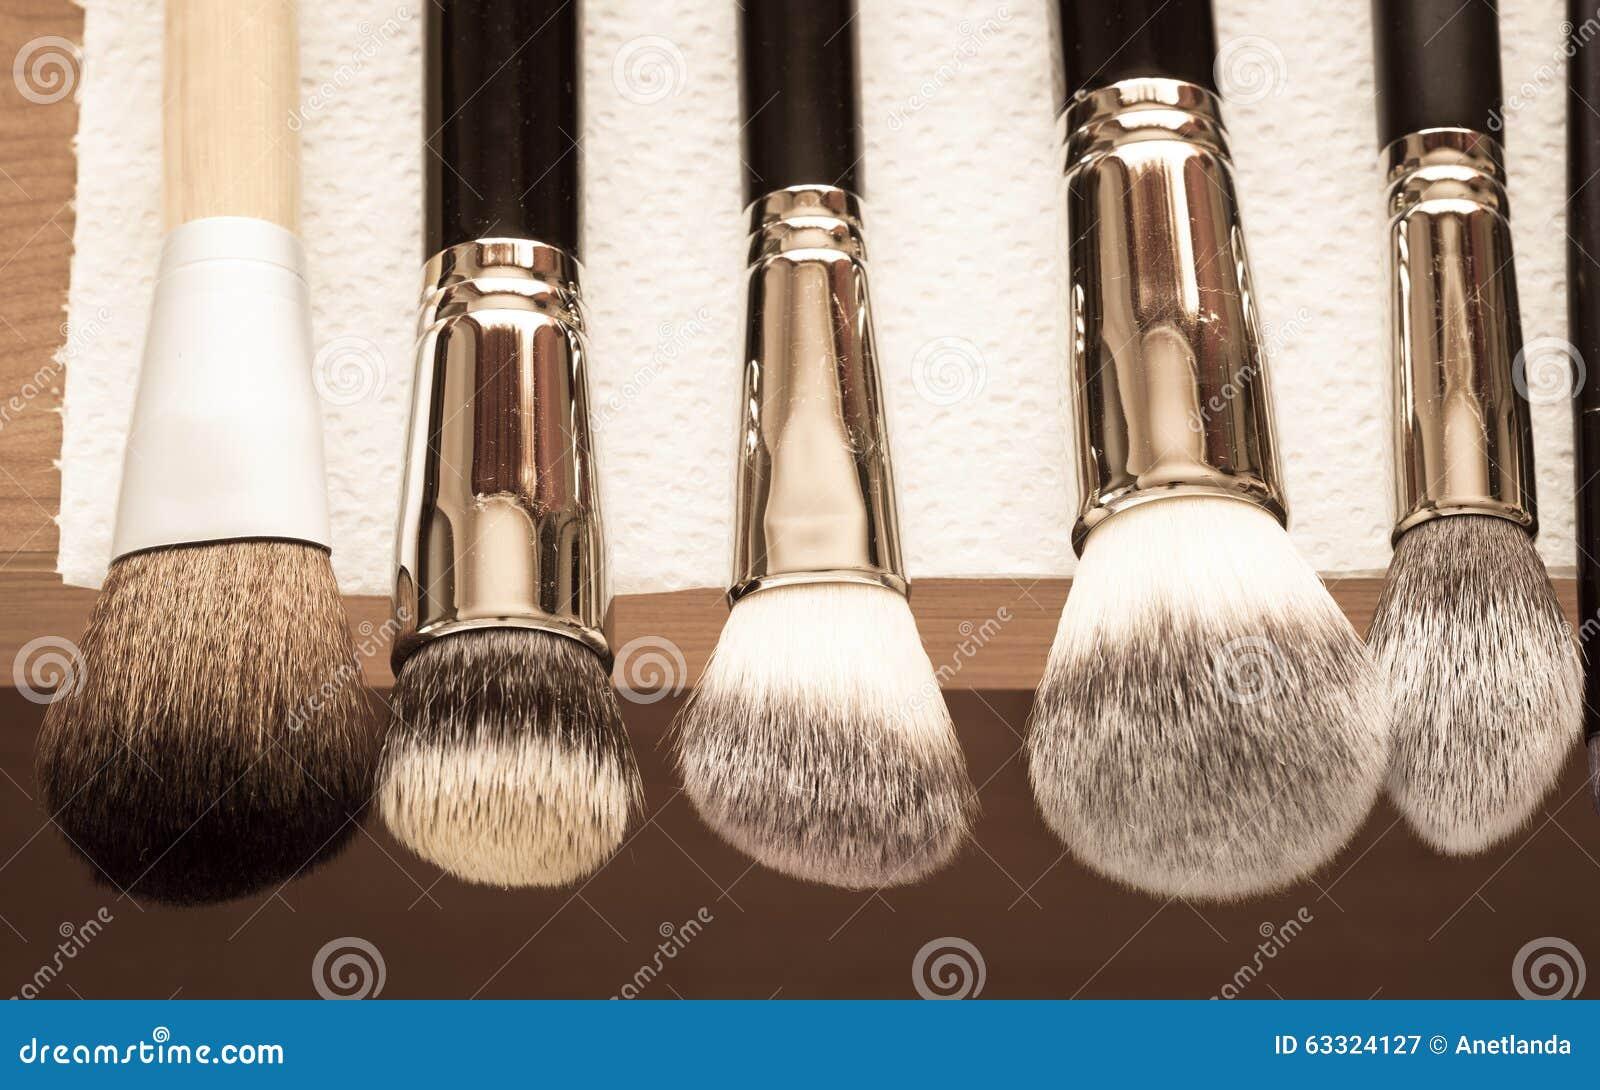 how long does it take for makeup brushes to dry after washing them mugeek vidalondon. Black Bedroom Furniture Sets. Home Design Ideas